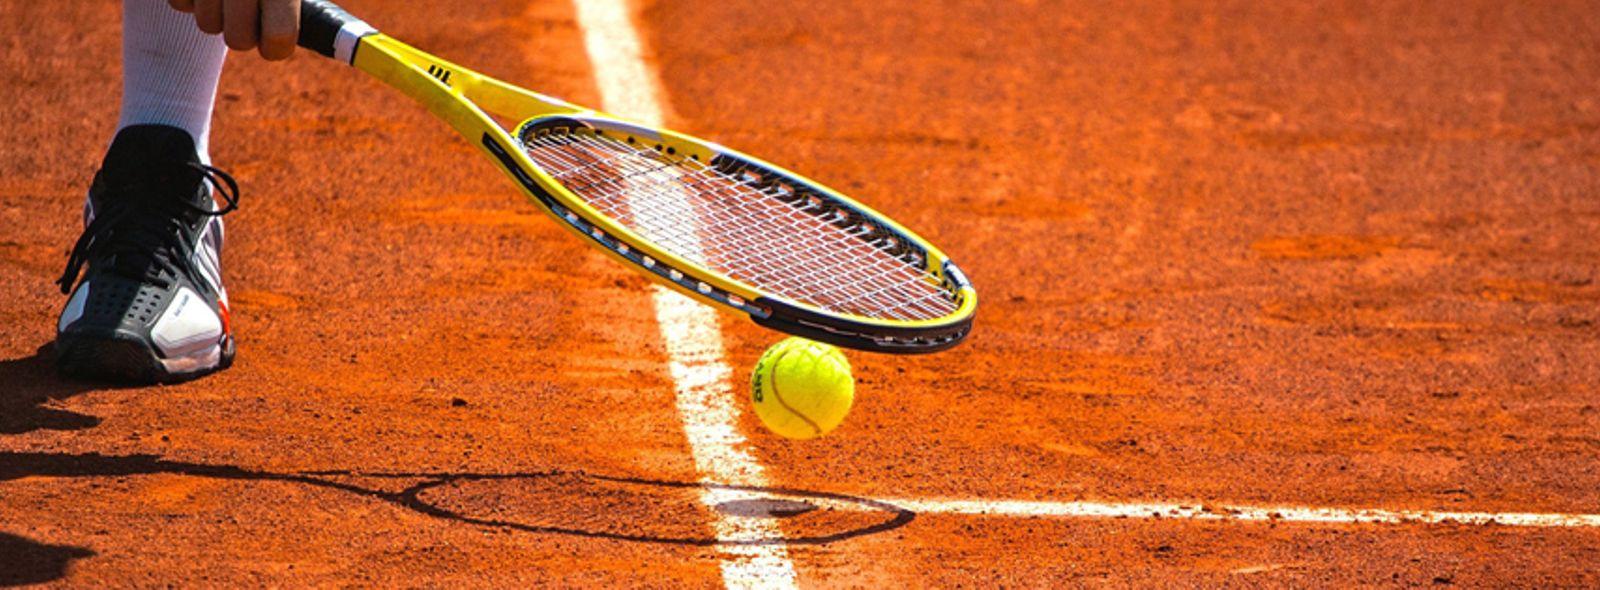 Campi da tennis Brescia